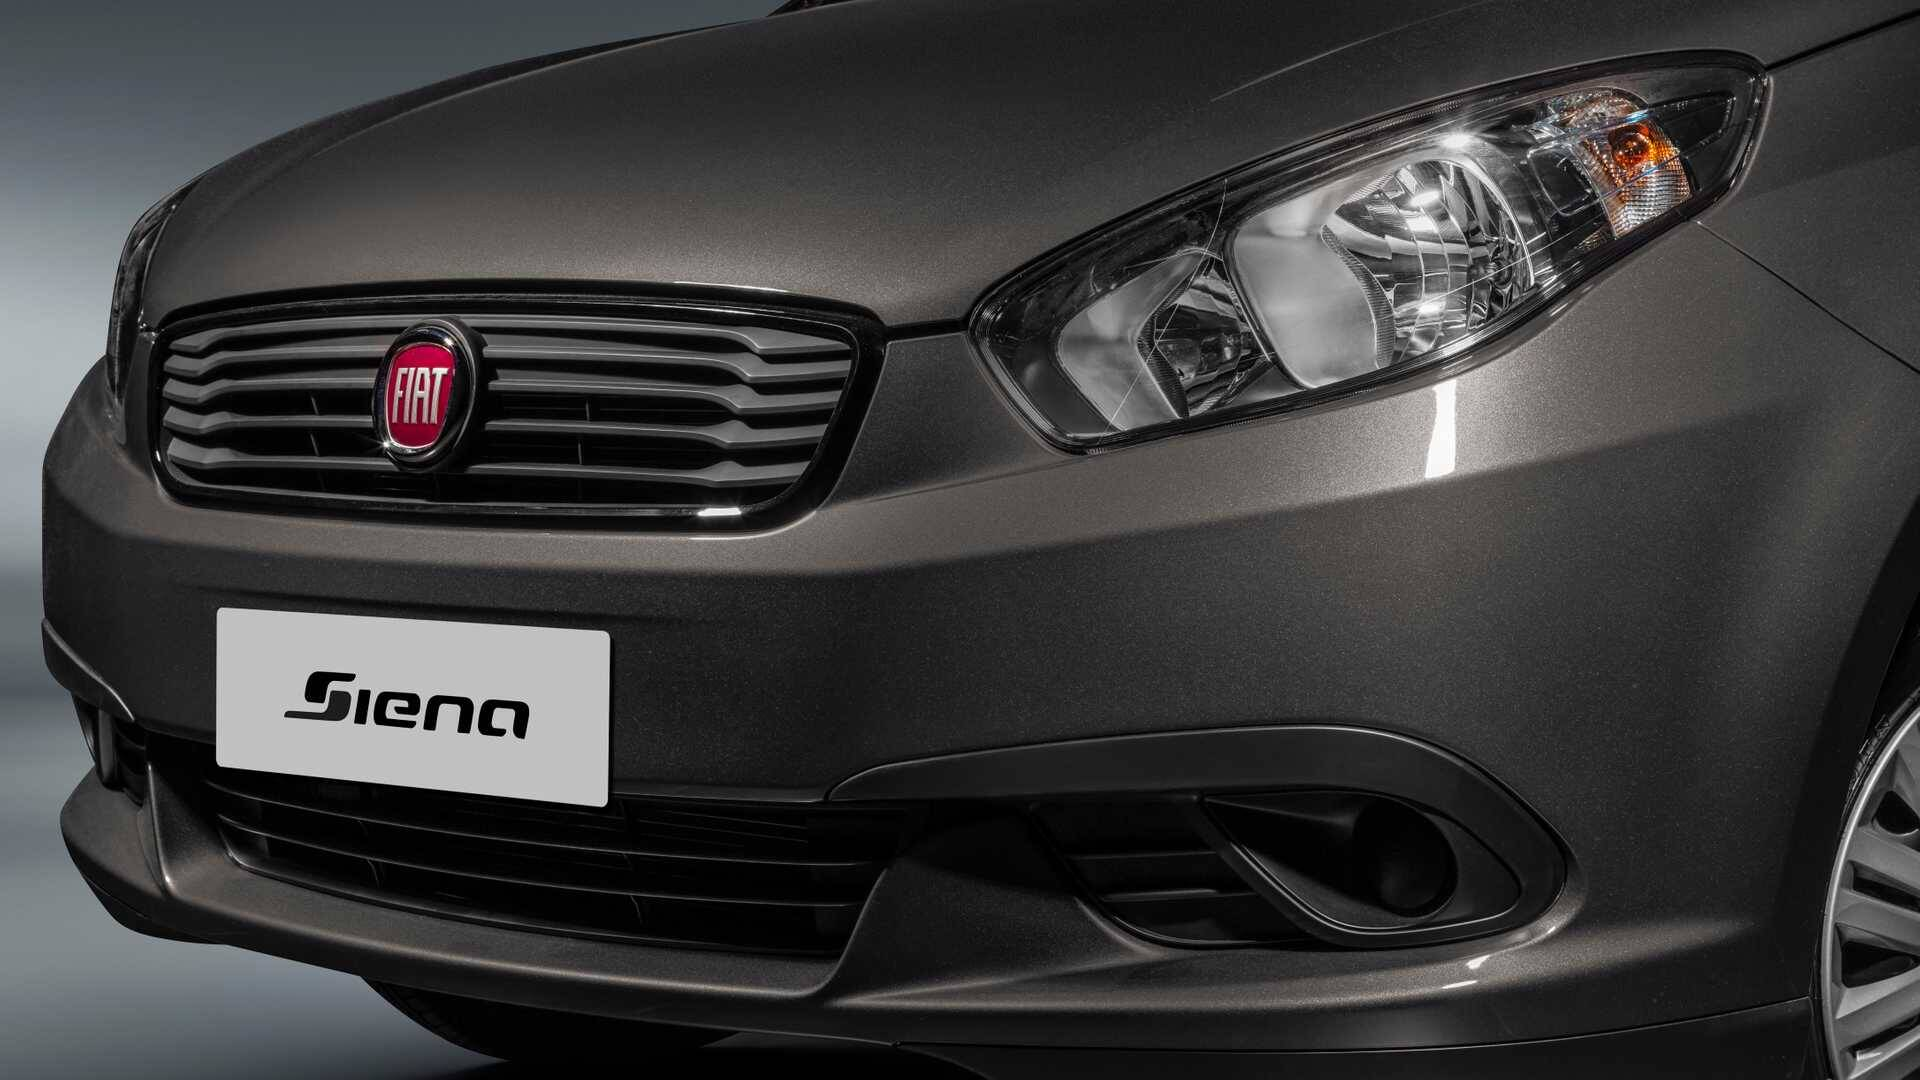 Fiat Grand Siena 2020. Foto: Divulgação